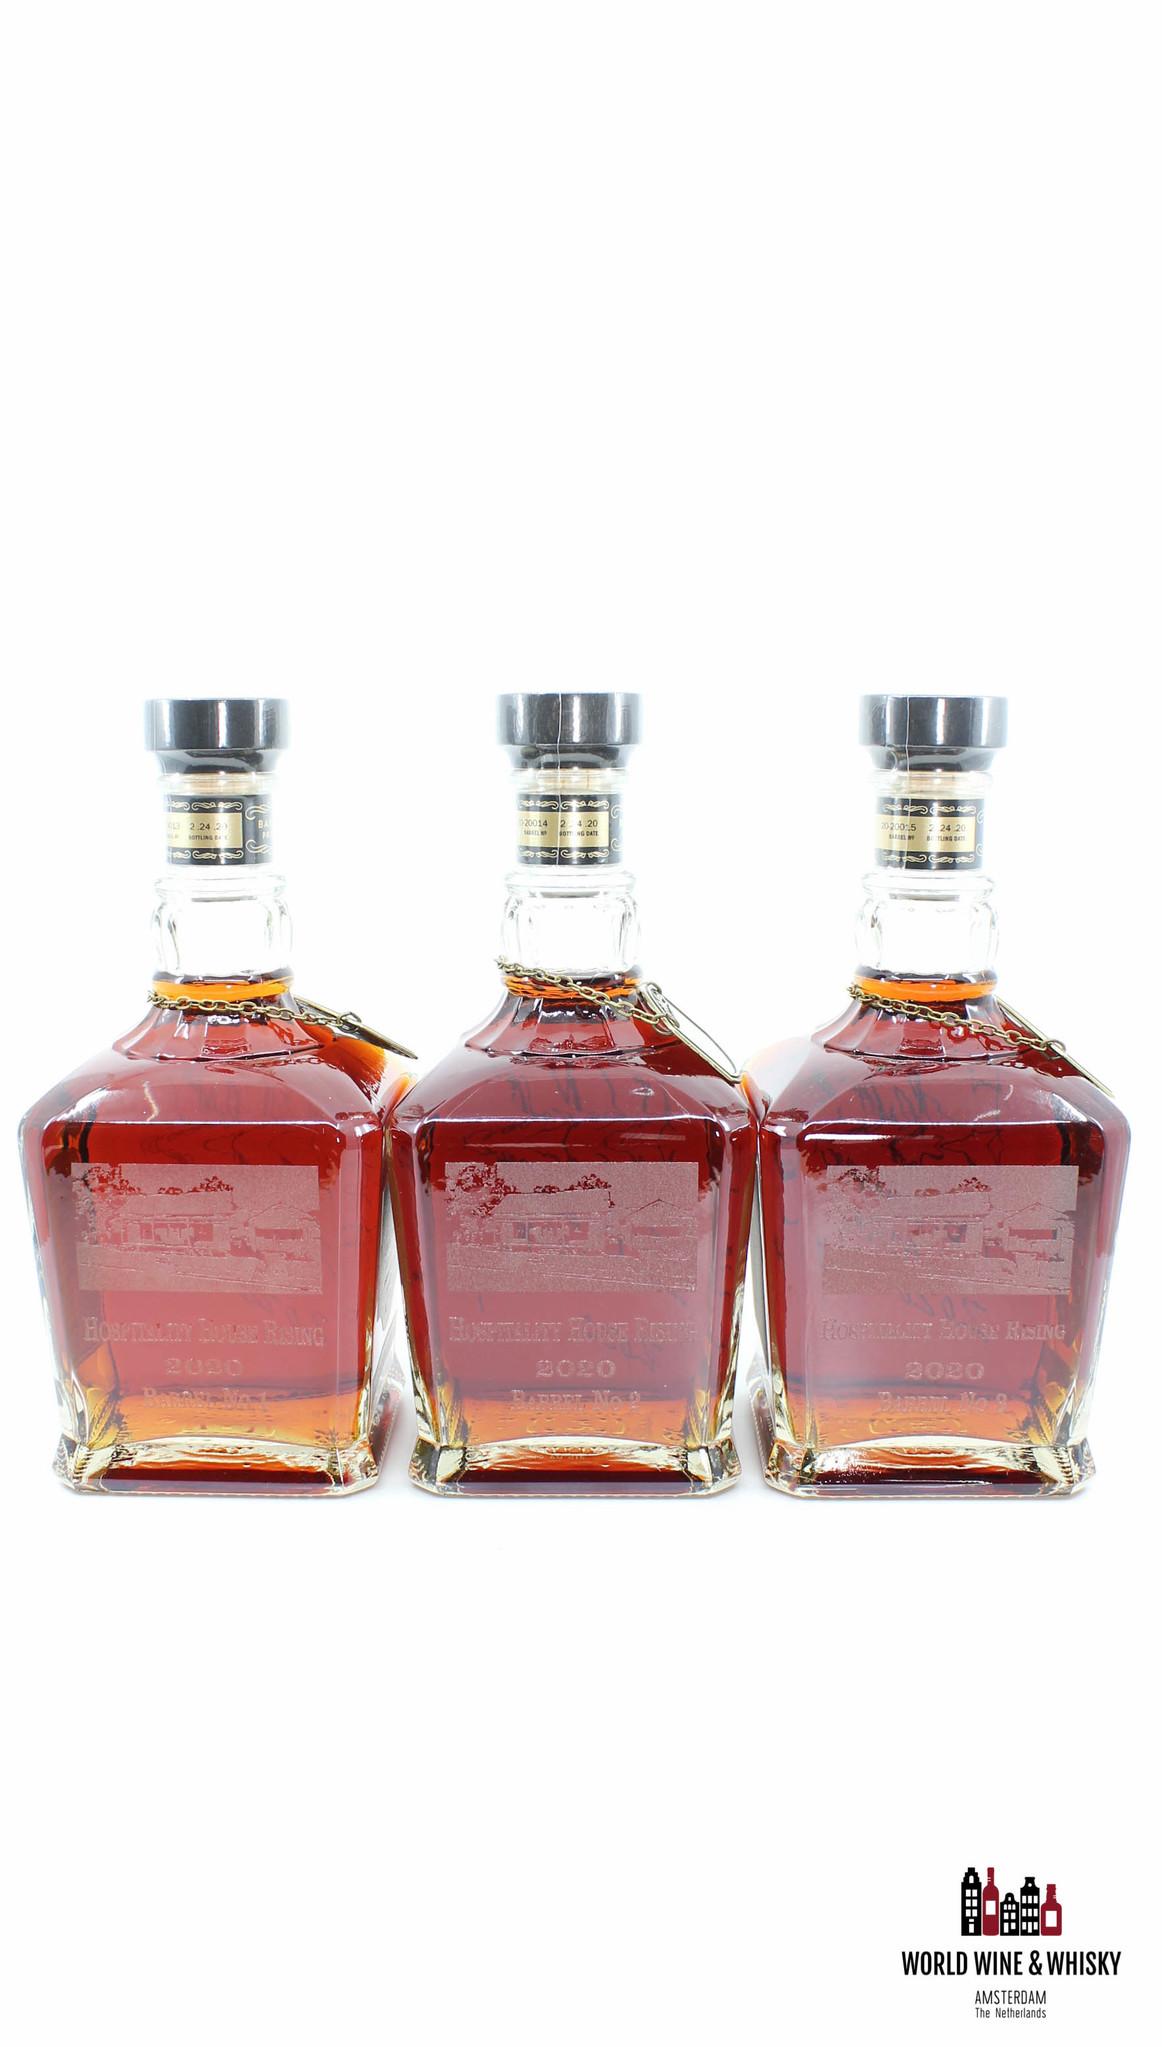 Jack Daniel's Jack Daniel's Select - Single Barrel - Hospitality House Rising 2020 - Barrel 1, 2 & 3 (full set)